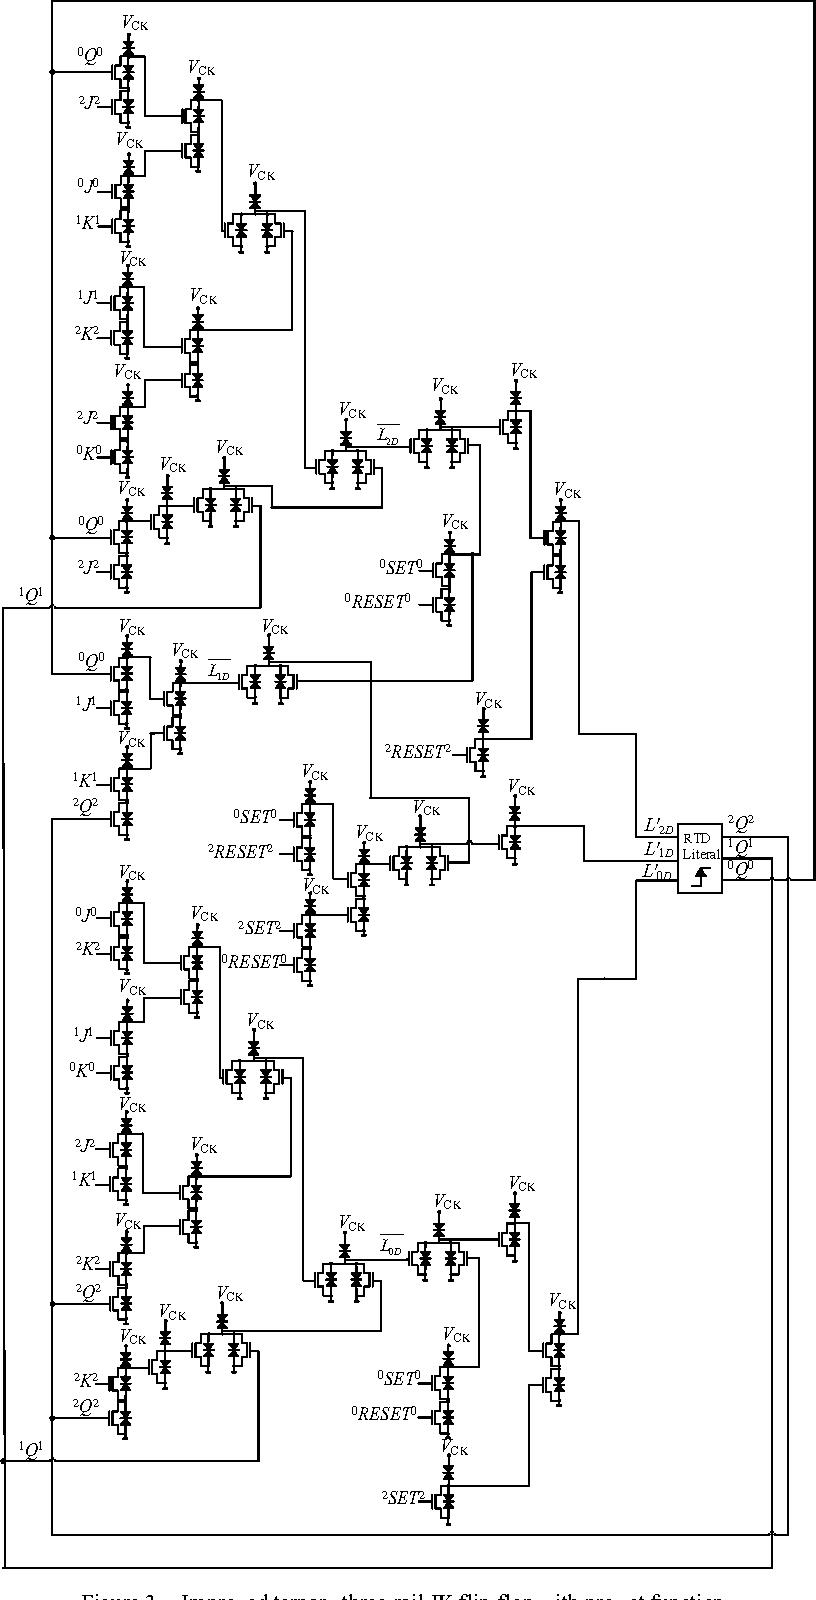 An Improved Ternary Three Rail Jk Flip Flop Design Semantic Scholar J K Logic Diagram Figure 3